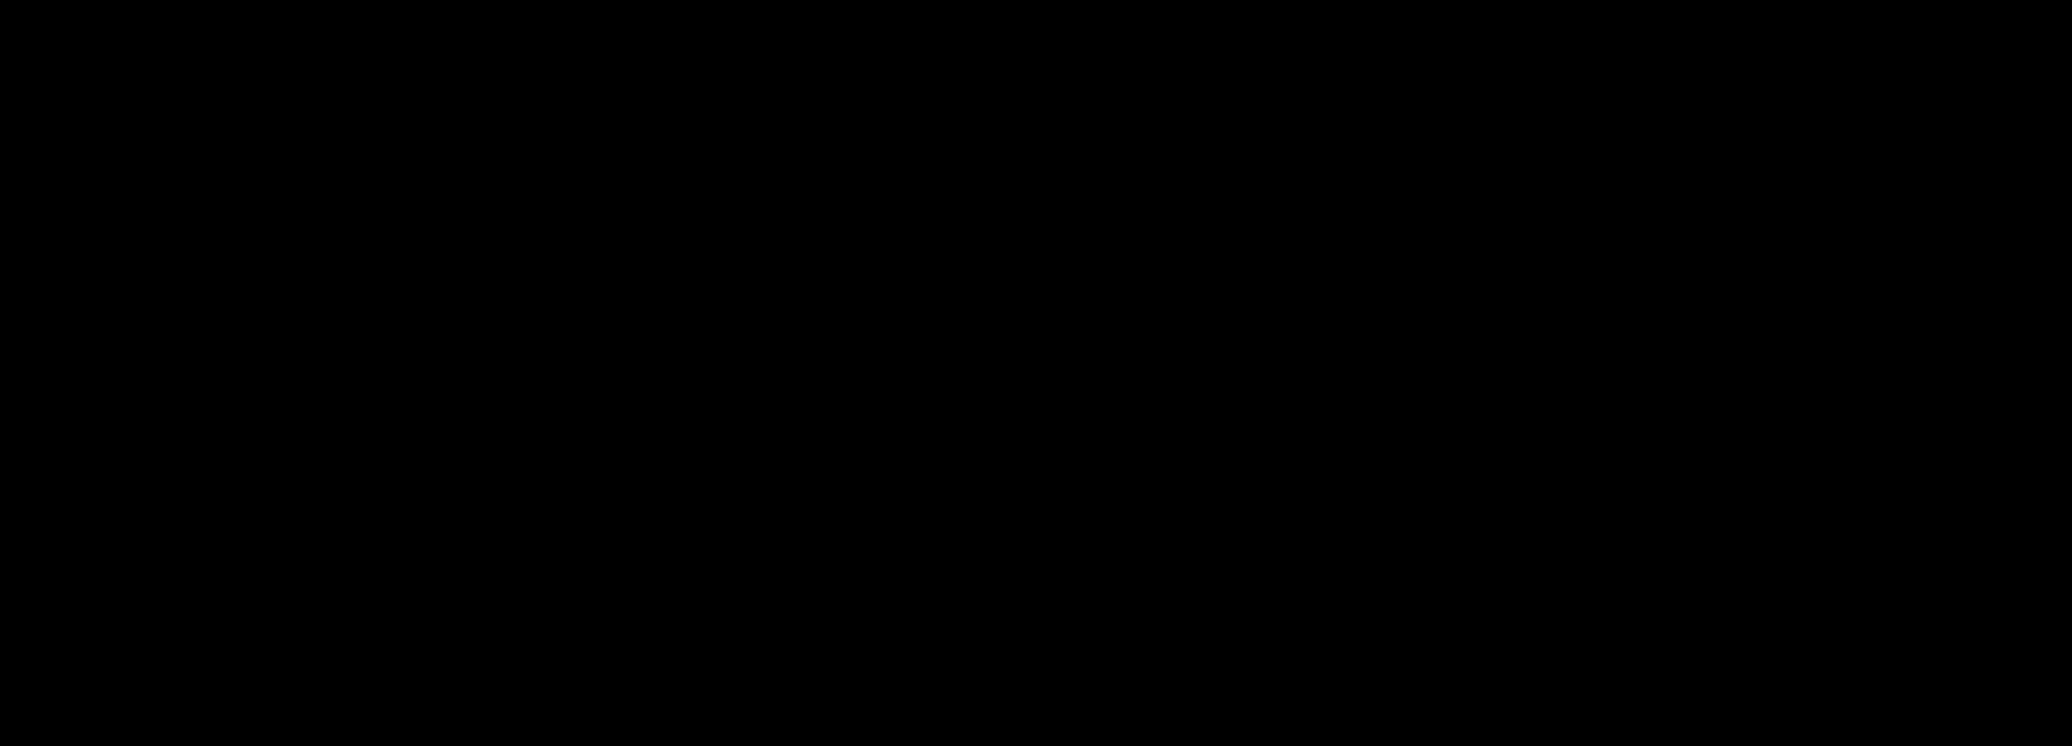 tert-Butyl 2-((2-(2-(7-hydroxycoumarin-4-yl)acetamido)ethyl)disulfanyl)ethylcarbamate